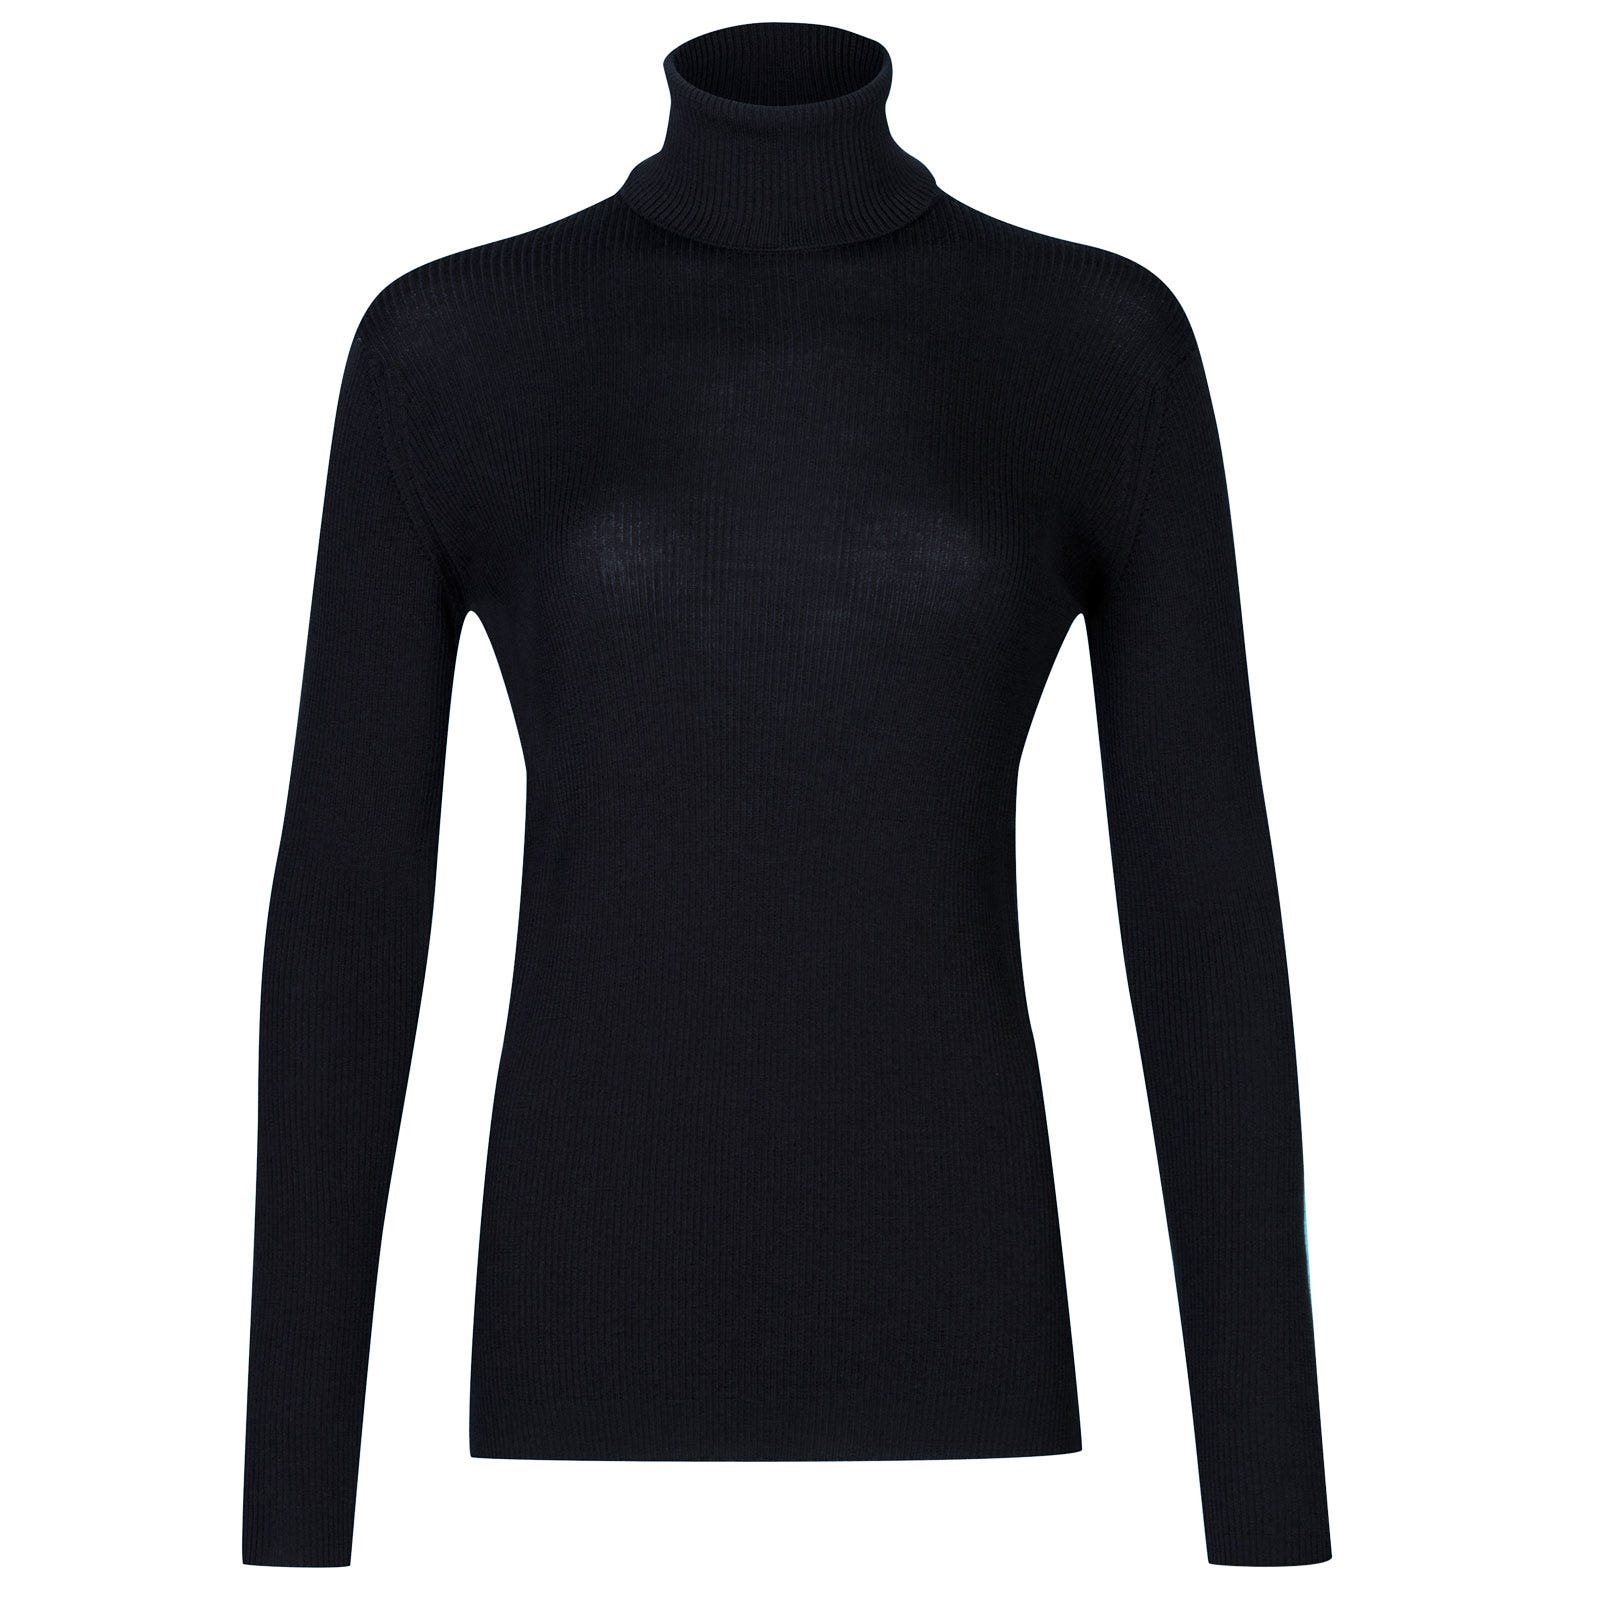 John Smedley massey Merino Wool Sweater in Midnight-XL